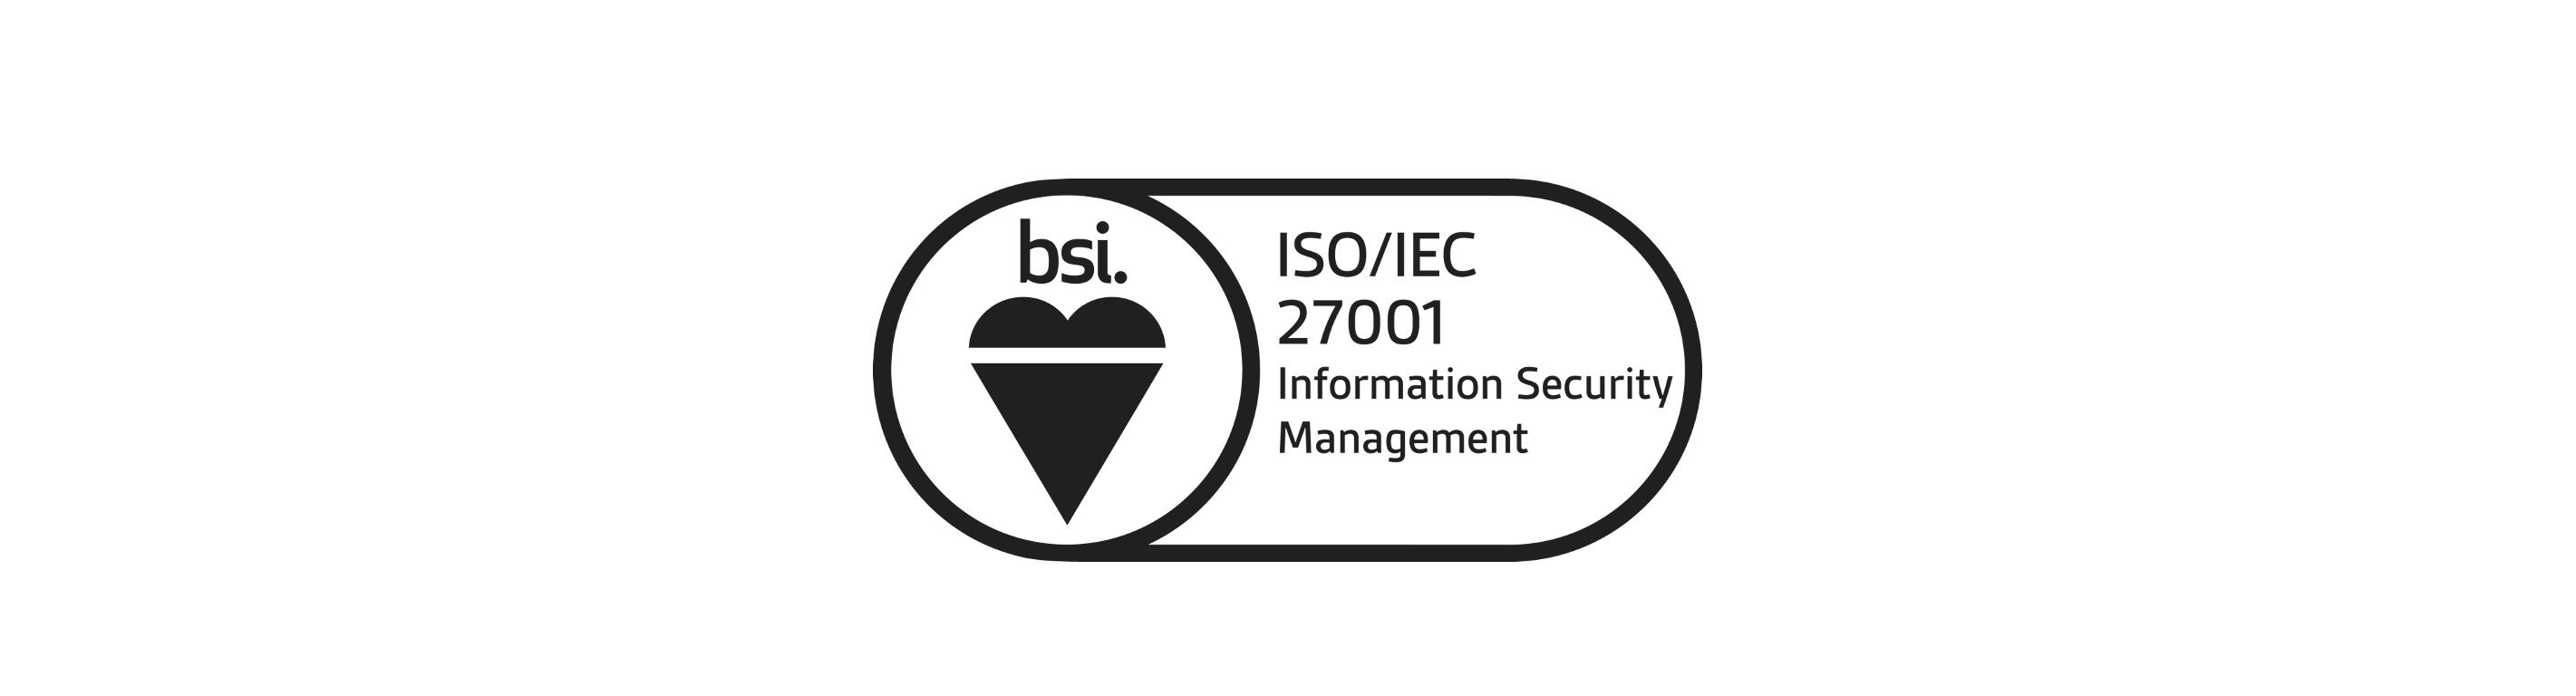 OXMT ia ISO 27001 certified.